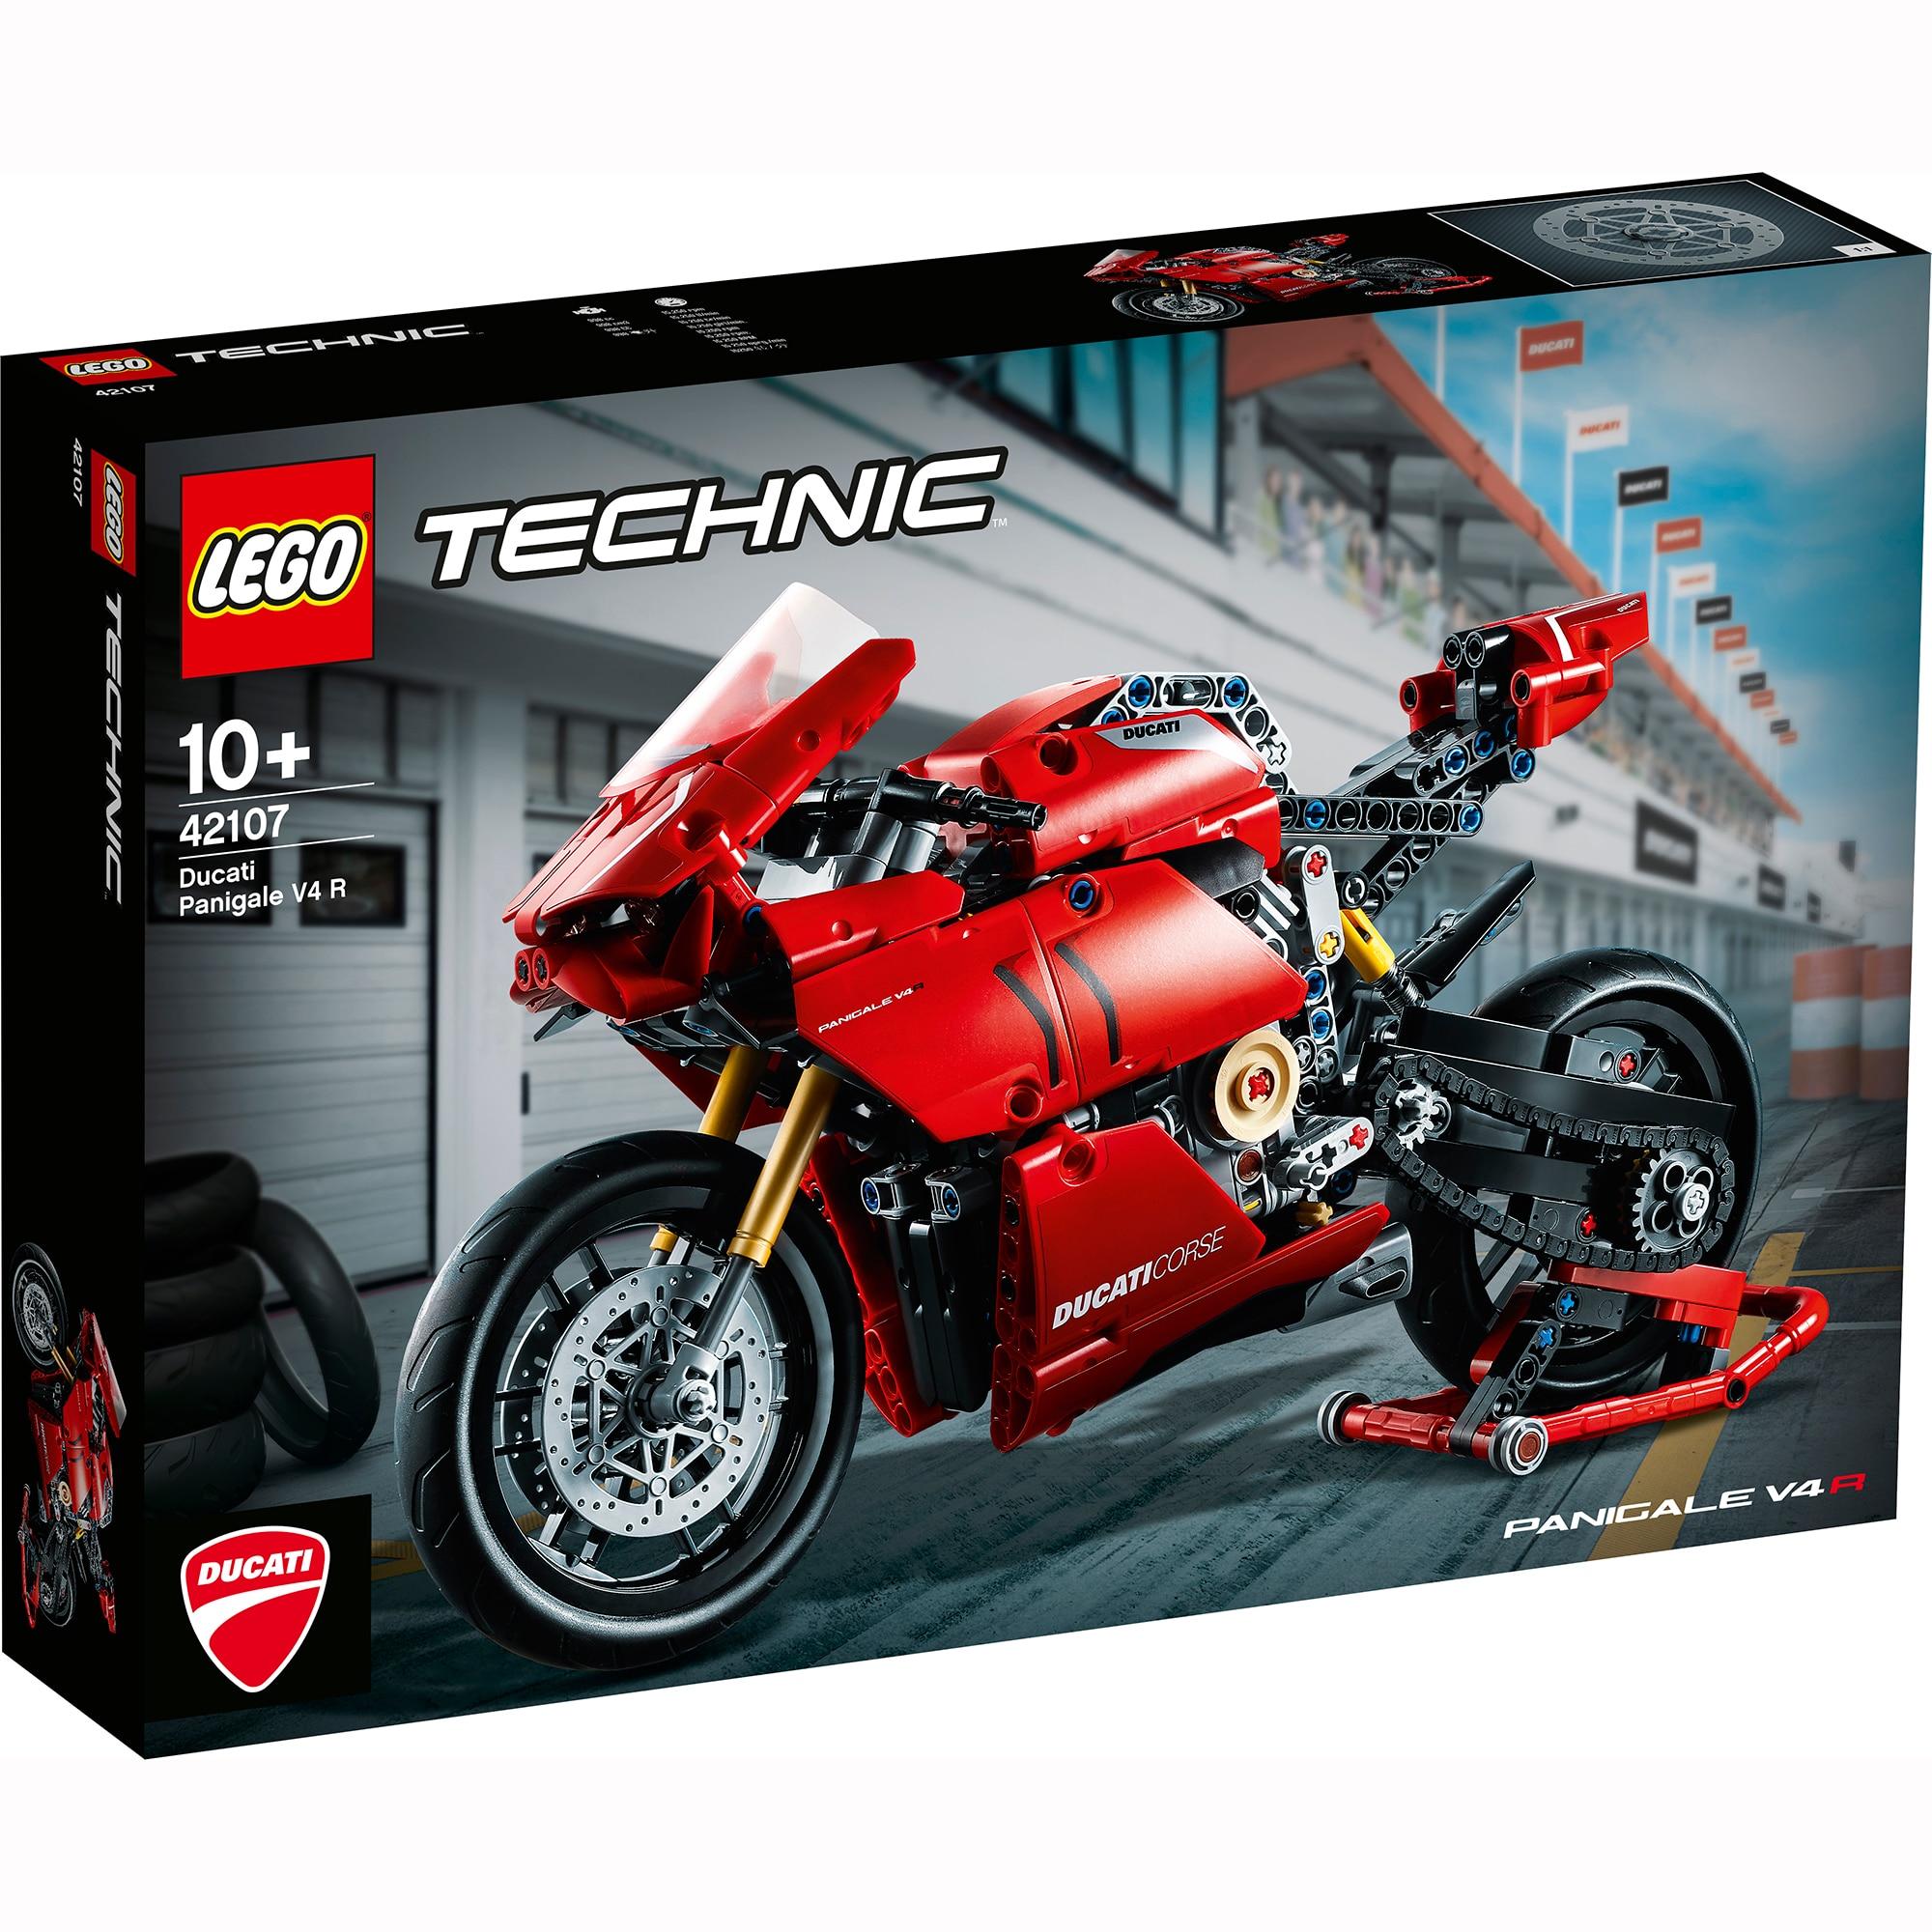 Fotografie LEGO Technic - Ducati Panigale V4 R 42107